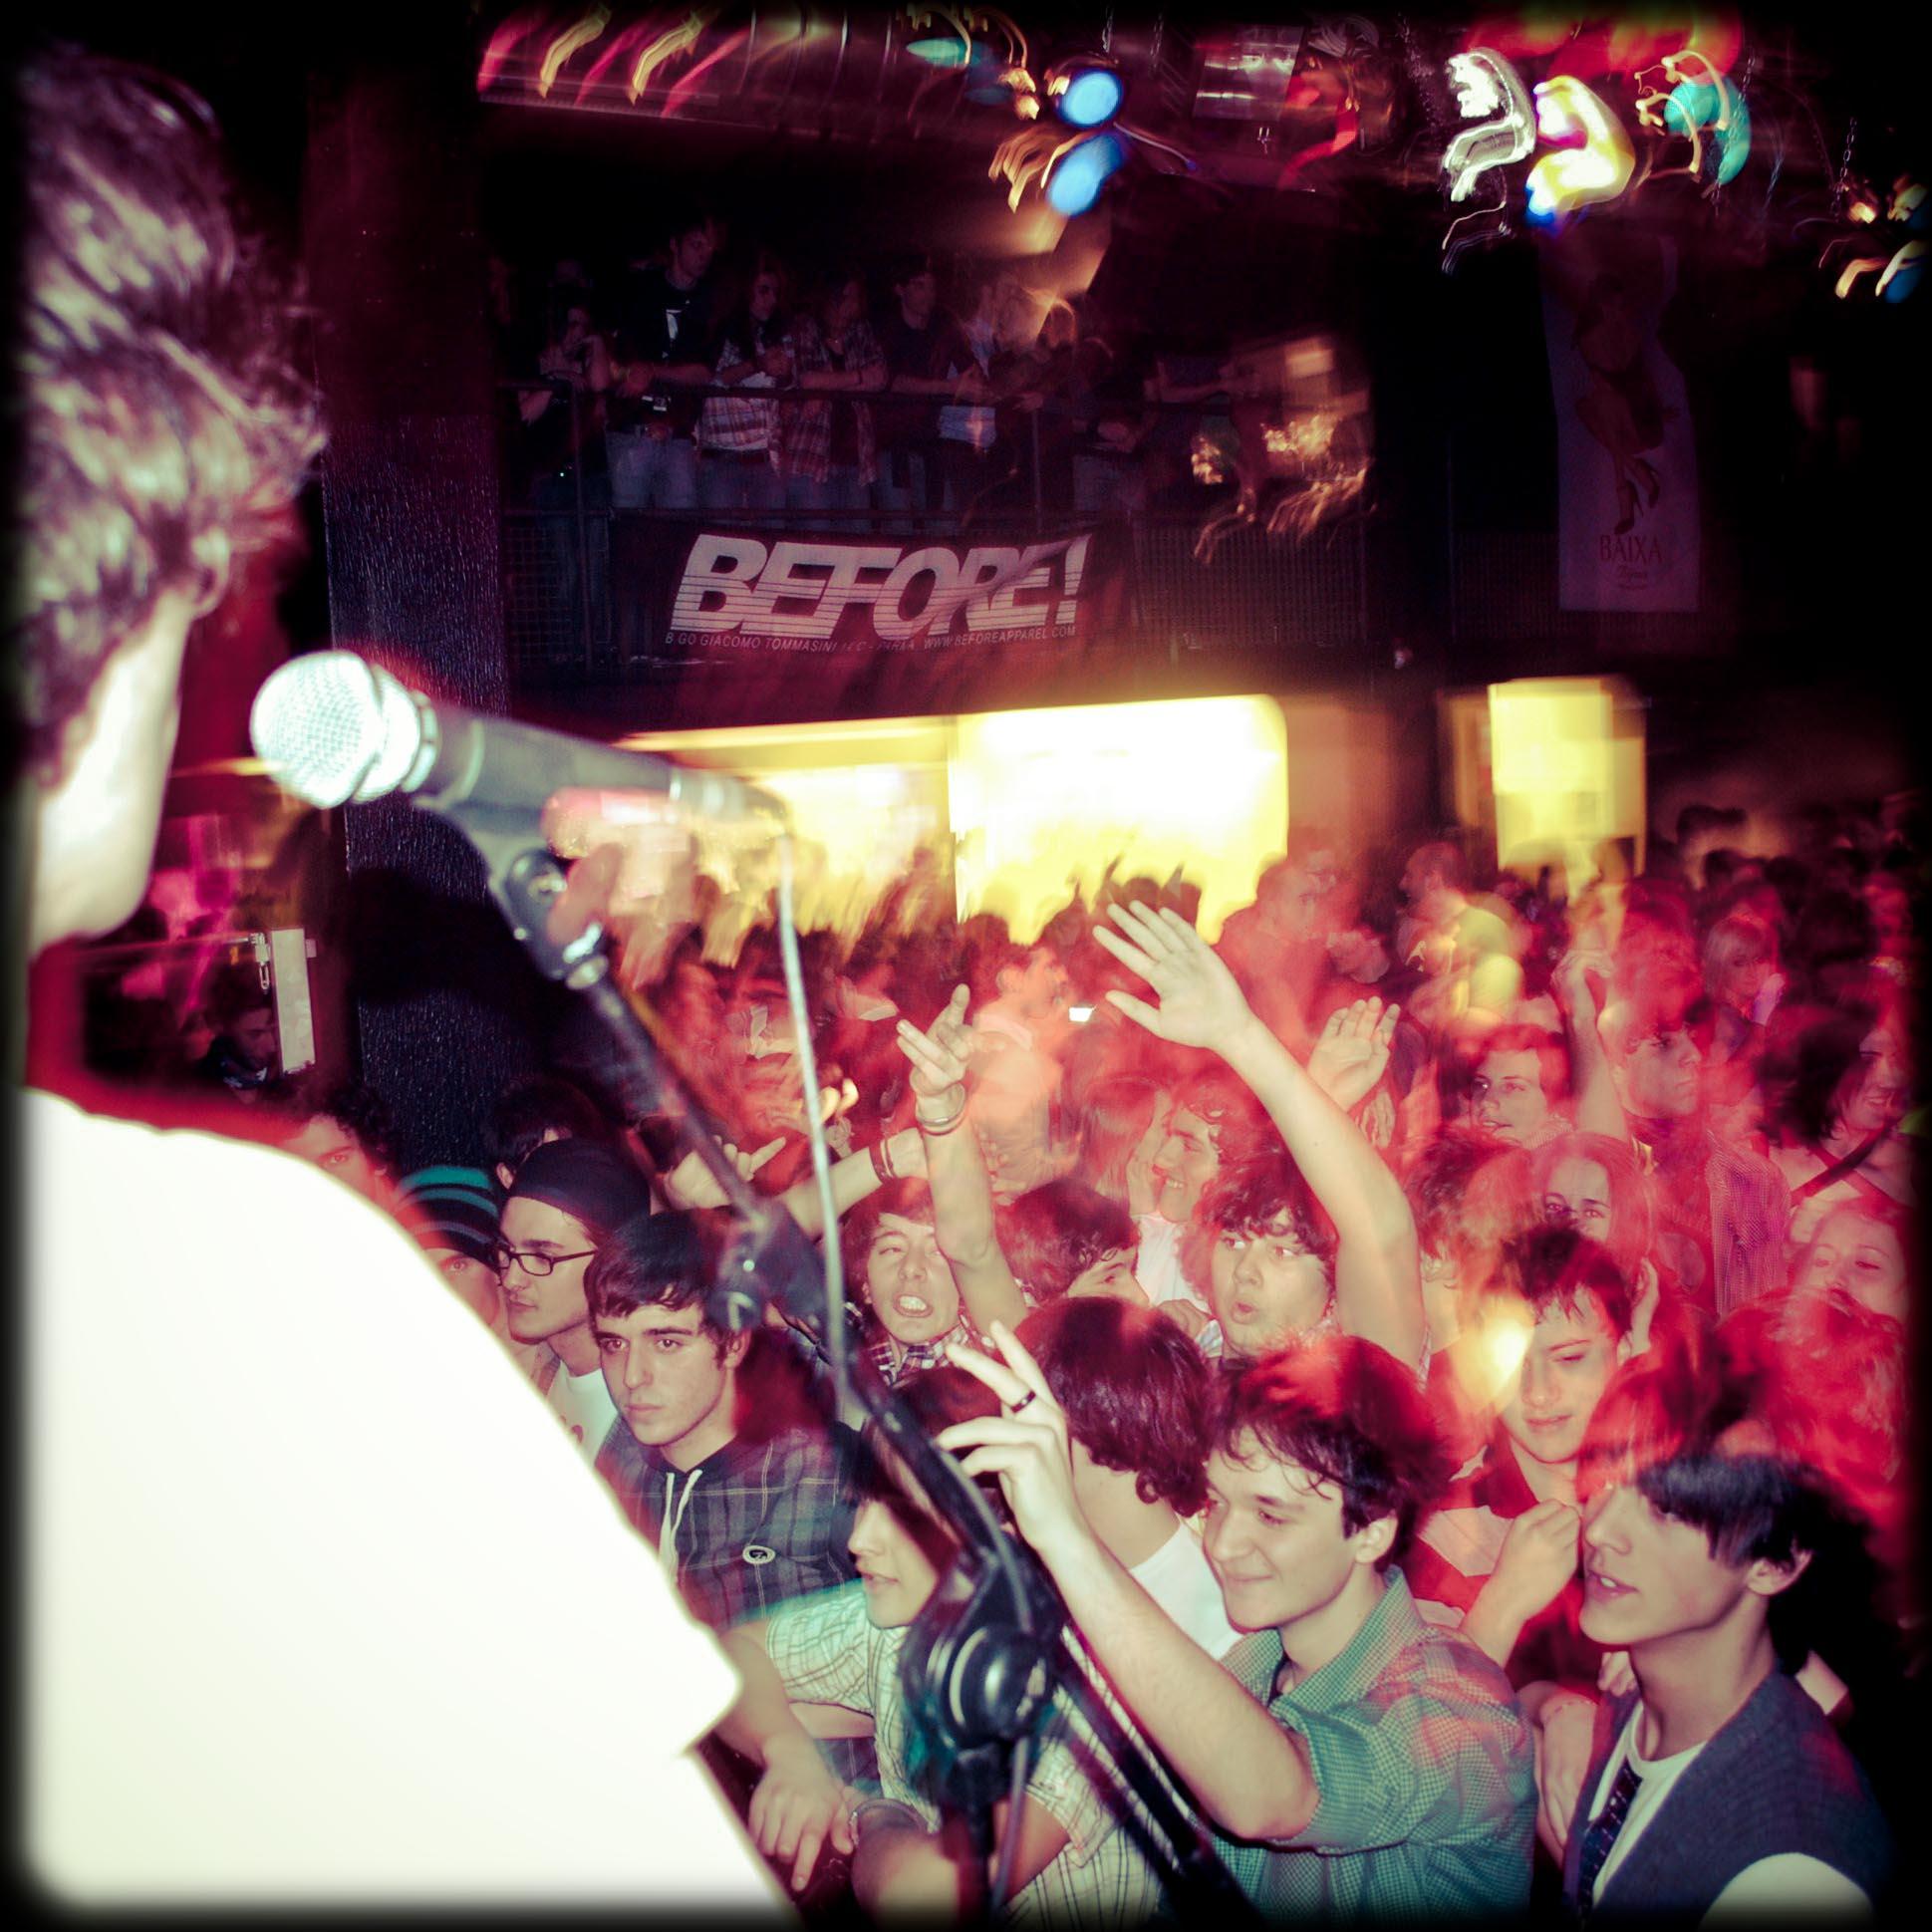 1990s+Hacienda live@London's corner - Bebop, 30 gennaio 2010